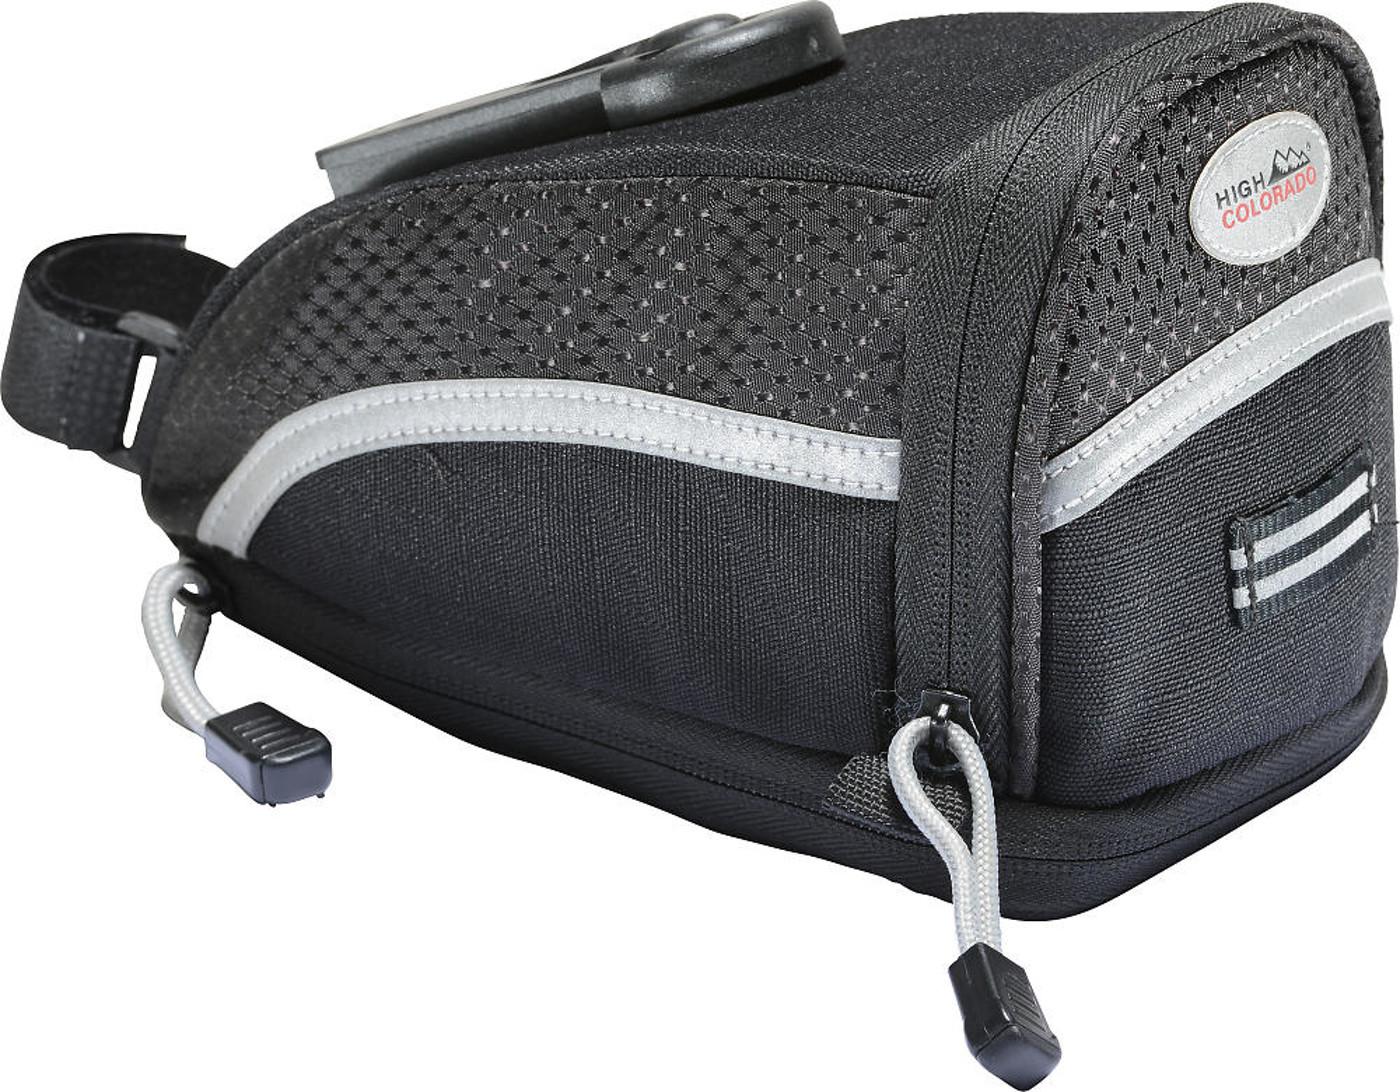 HIGH COLORADO saddle bag front opening